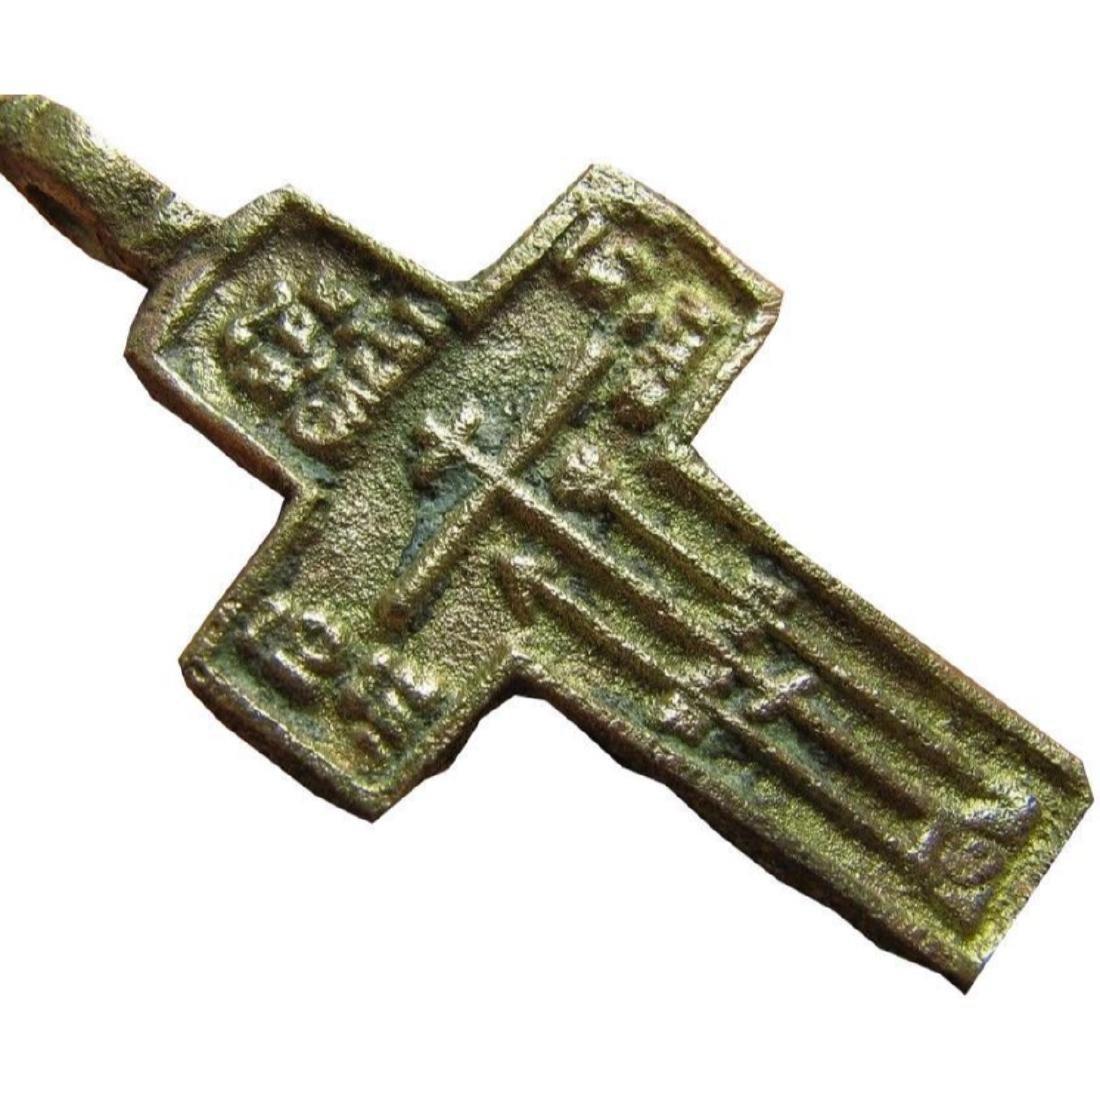 Rare Prayer Relief Big Late Medieval Orthodox Bronze - 5